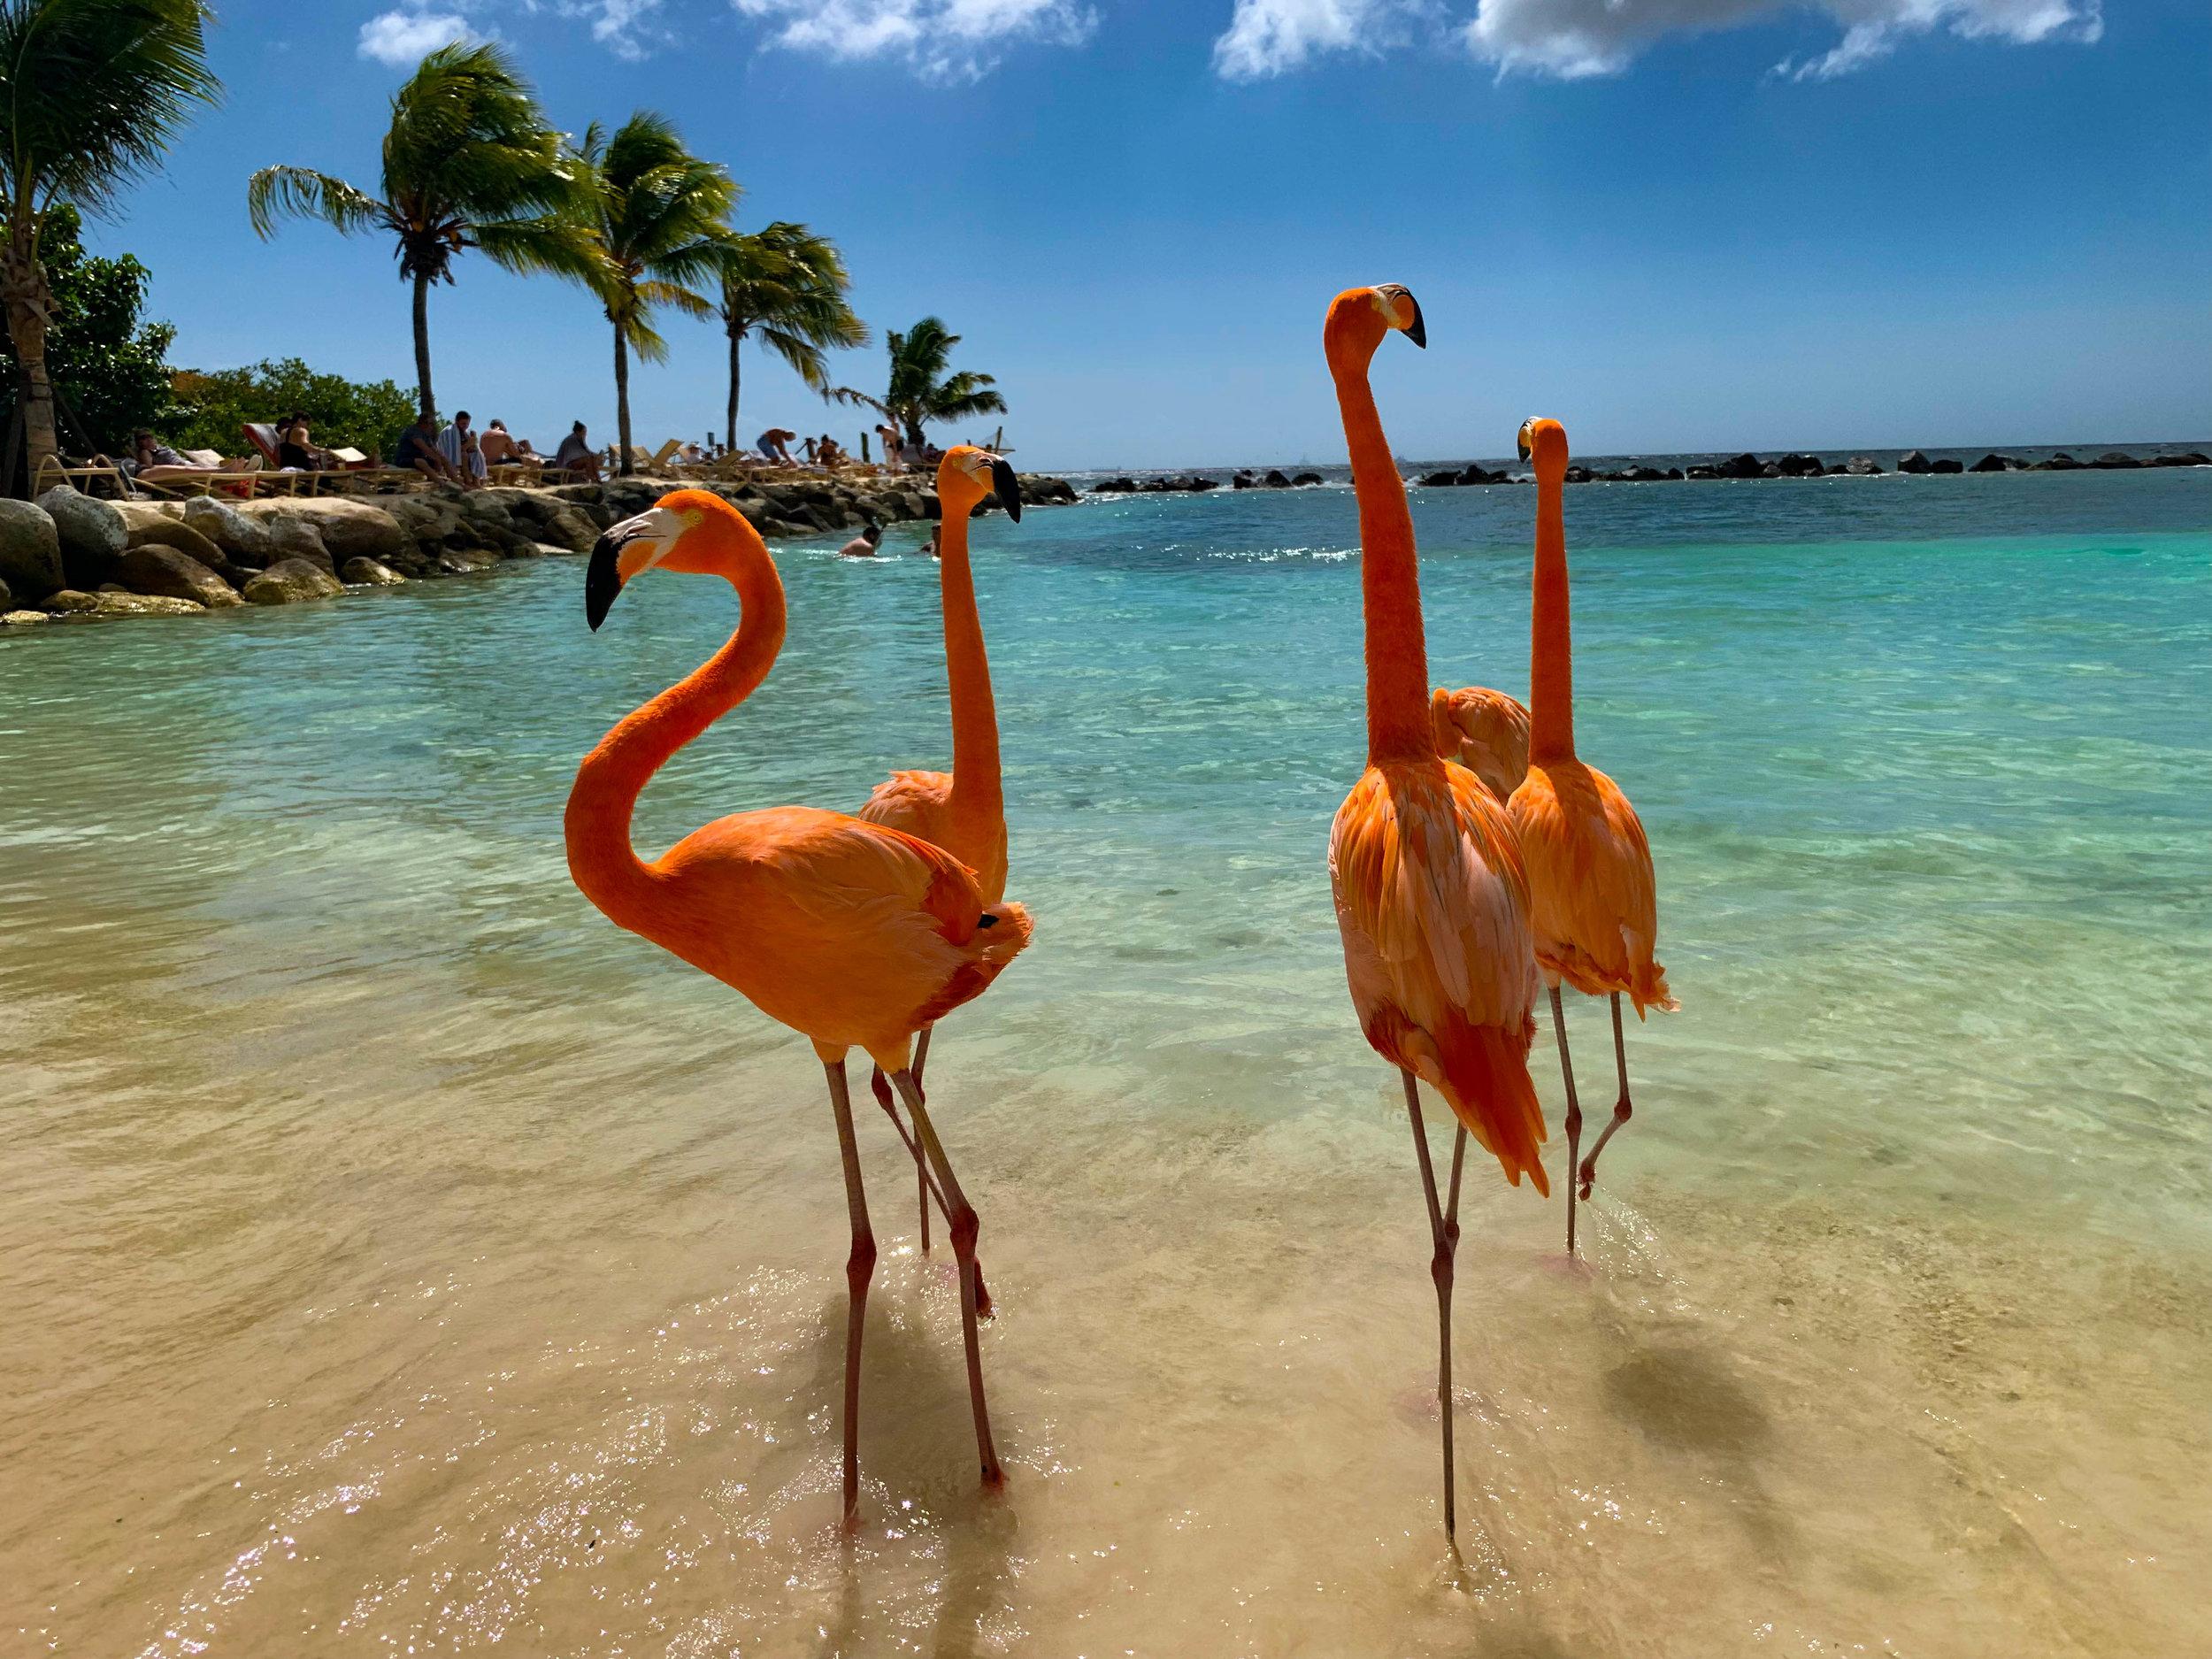 Renaissance Island - Flamingo Beach